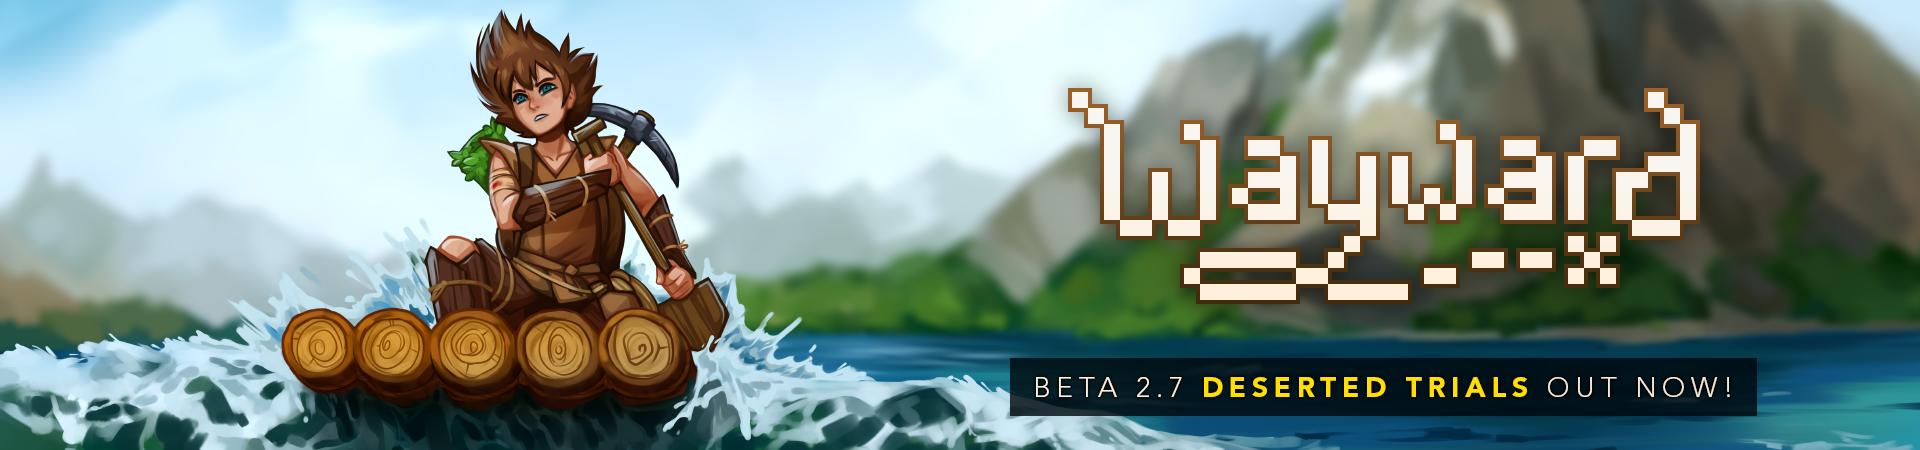 Beta 2.7 Banner